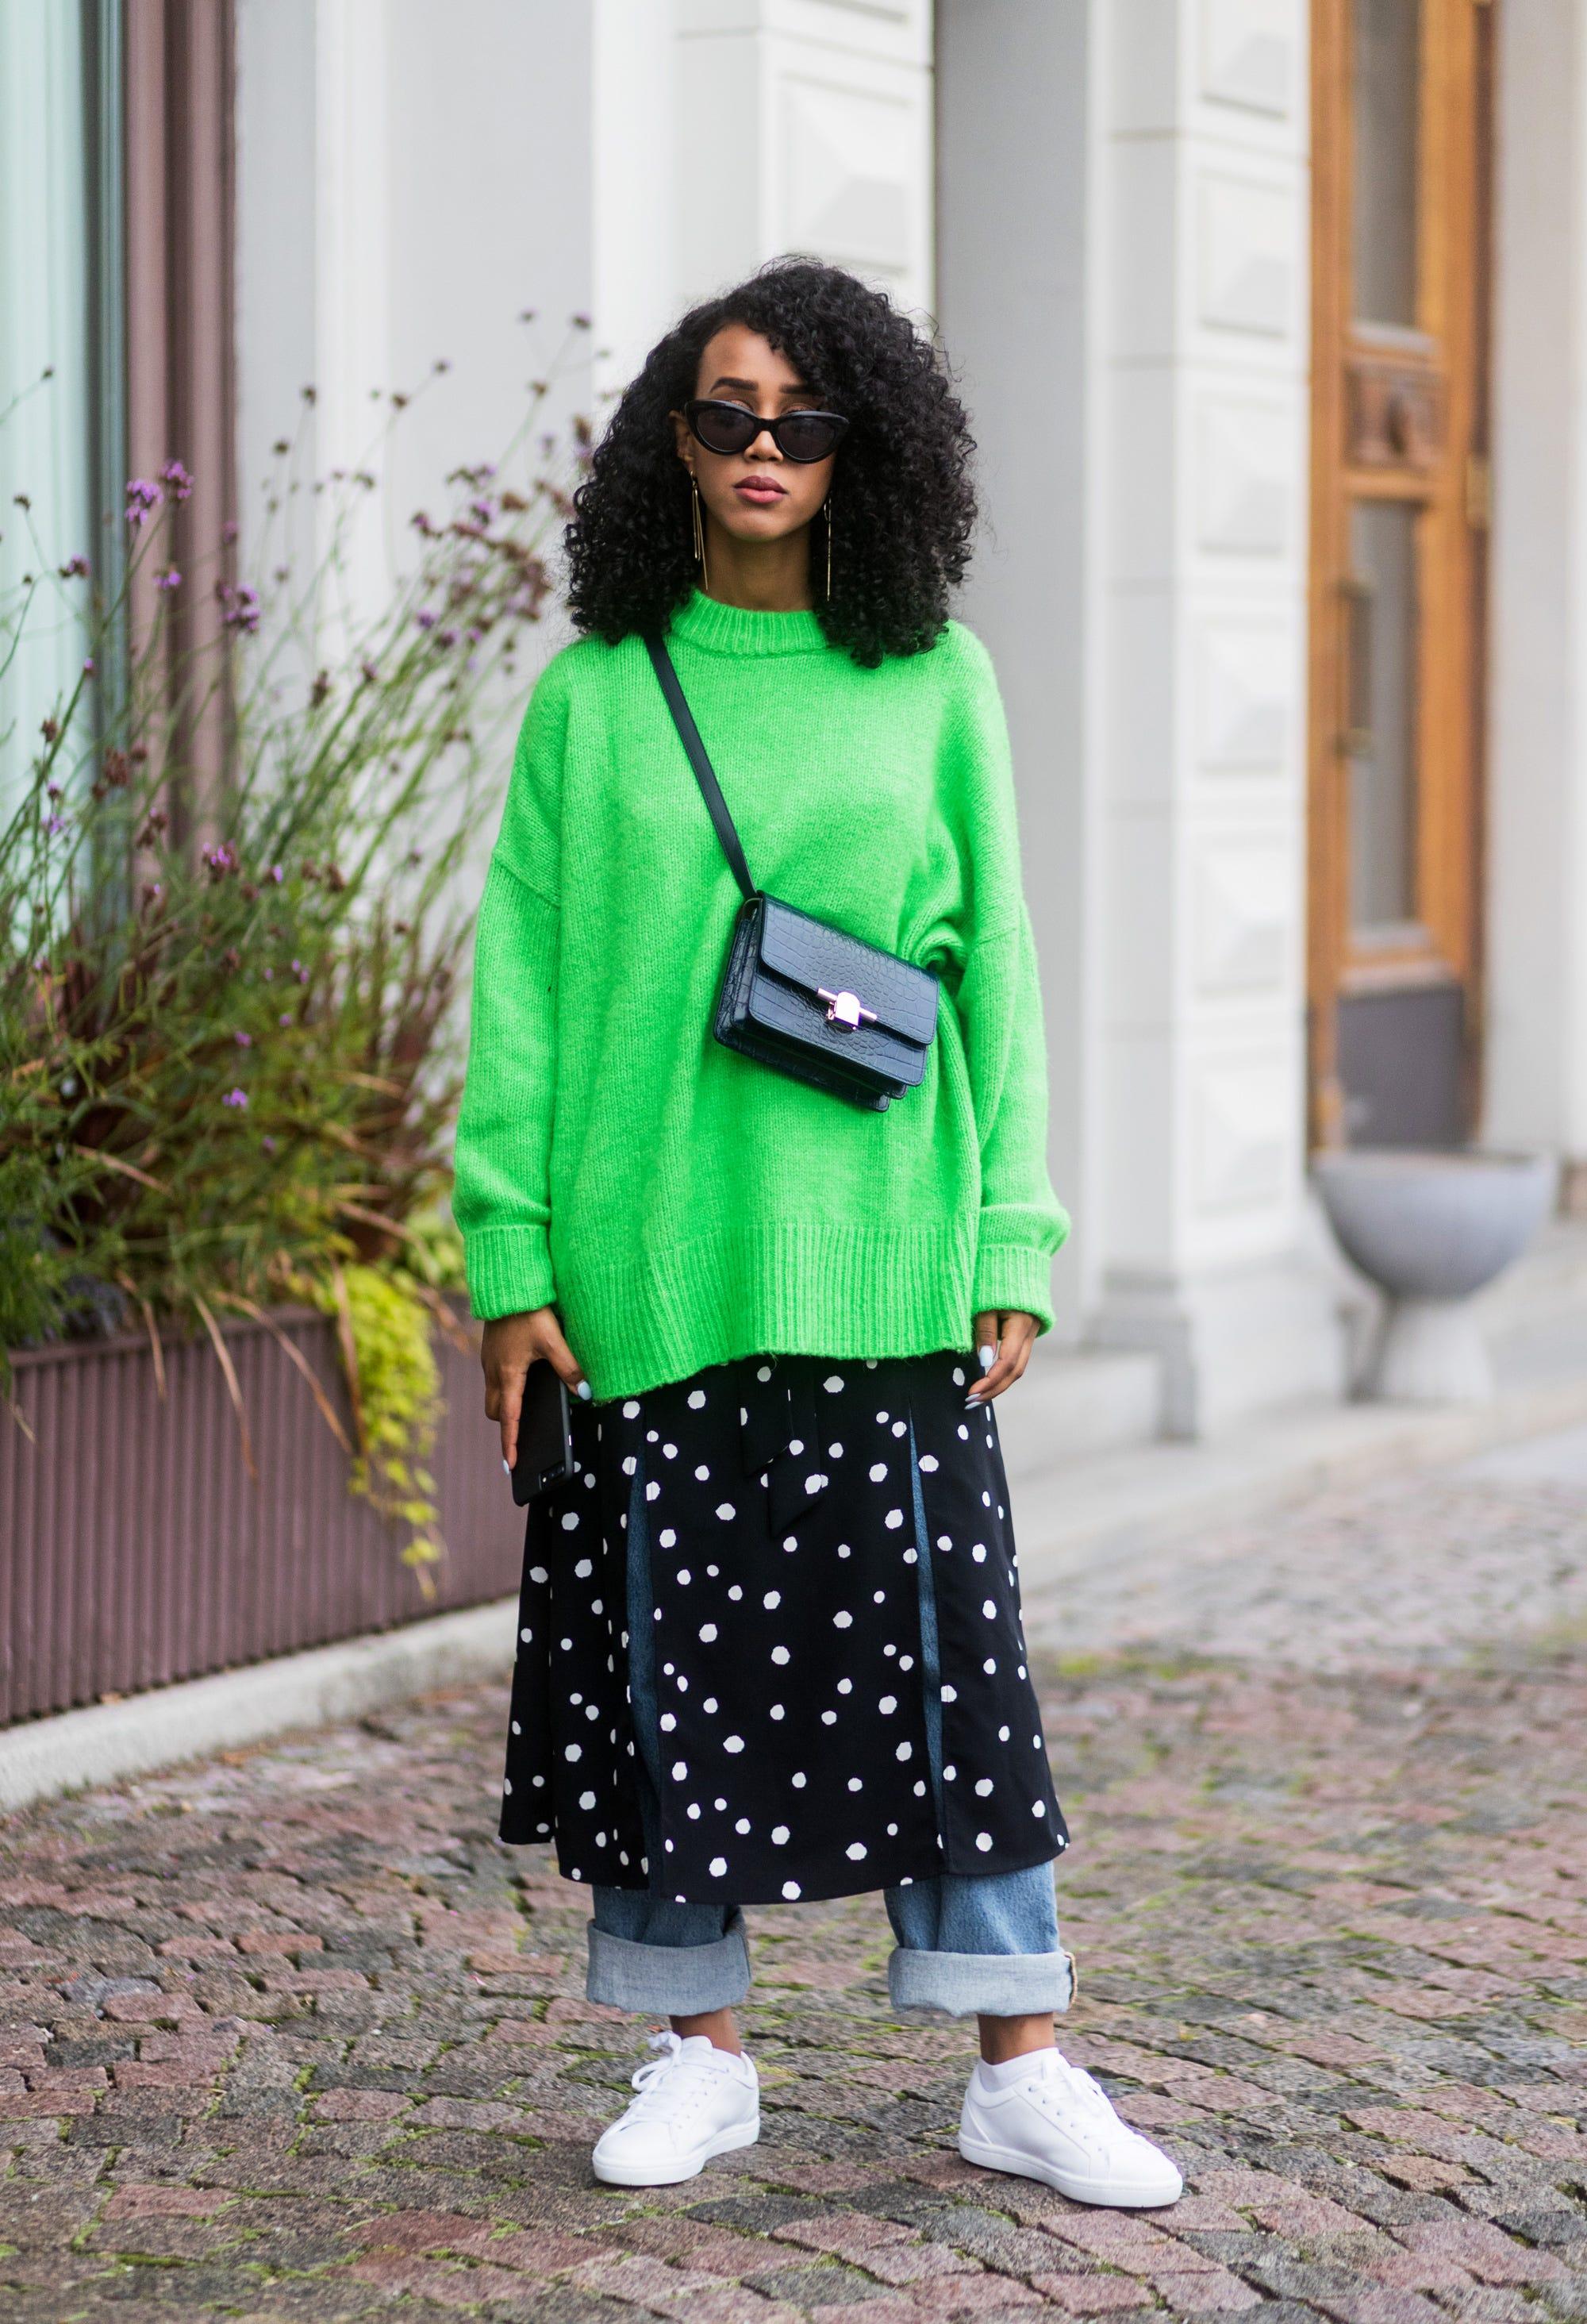 Cute Ways To Wear The Polka Dot Trend Winter 2018